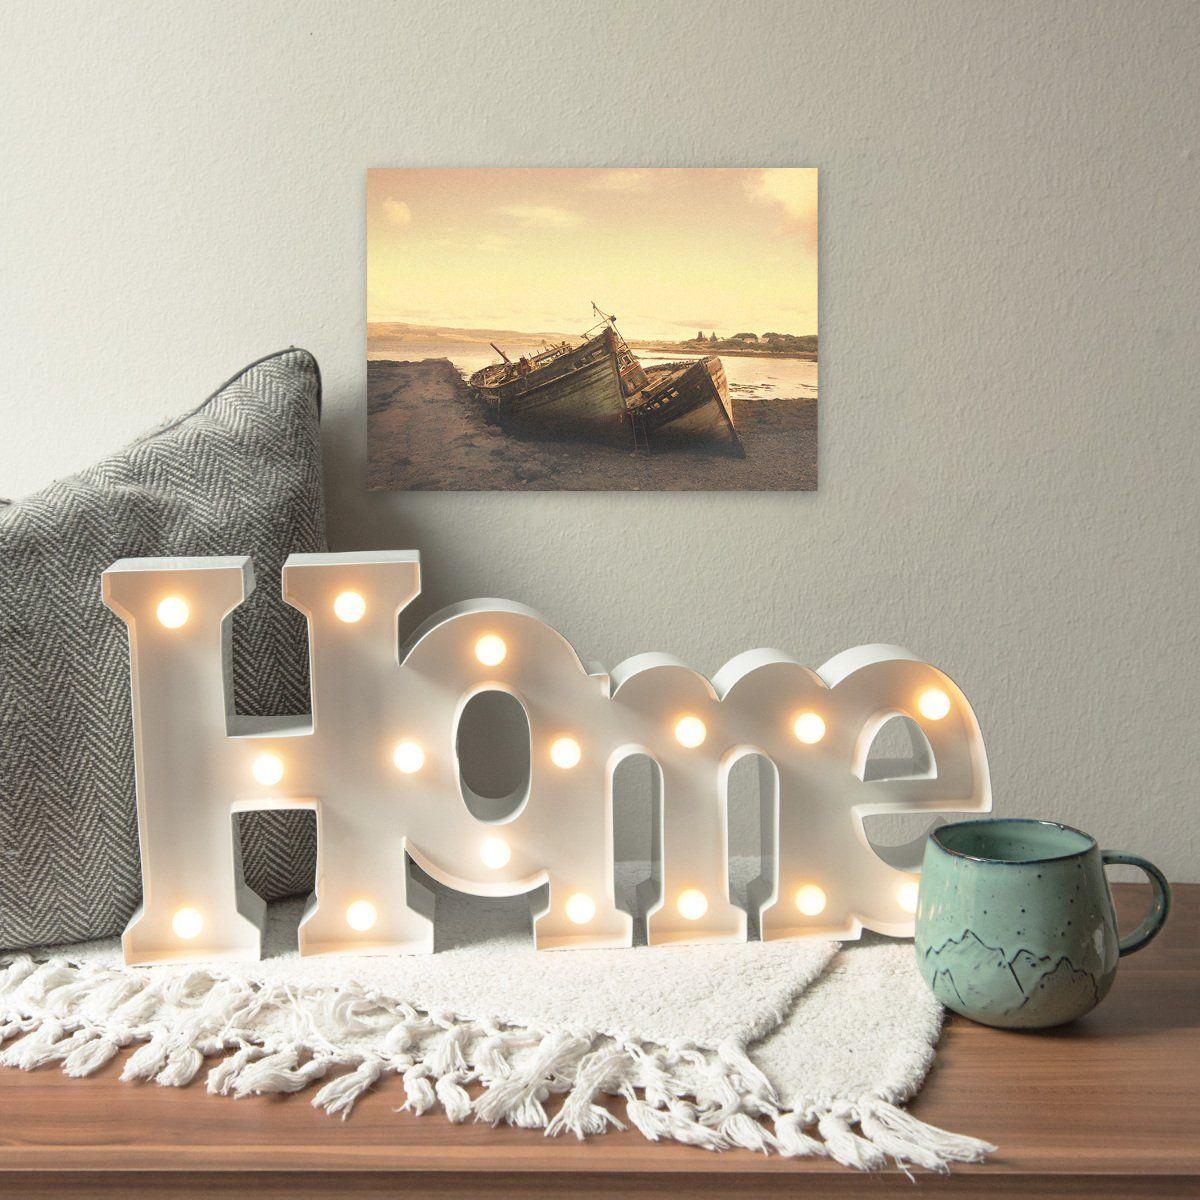 Lámparas y luces cálidas para un salón acogedor